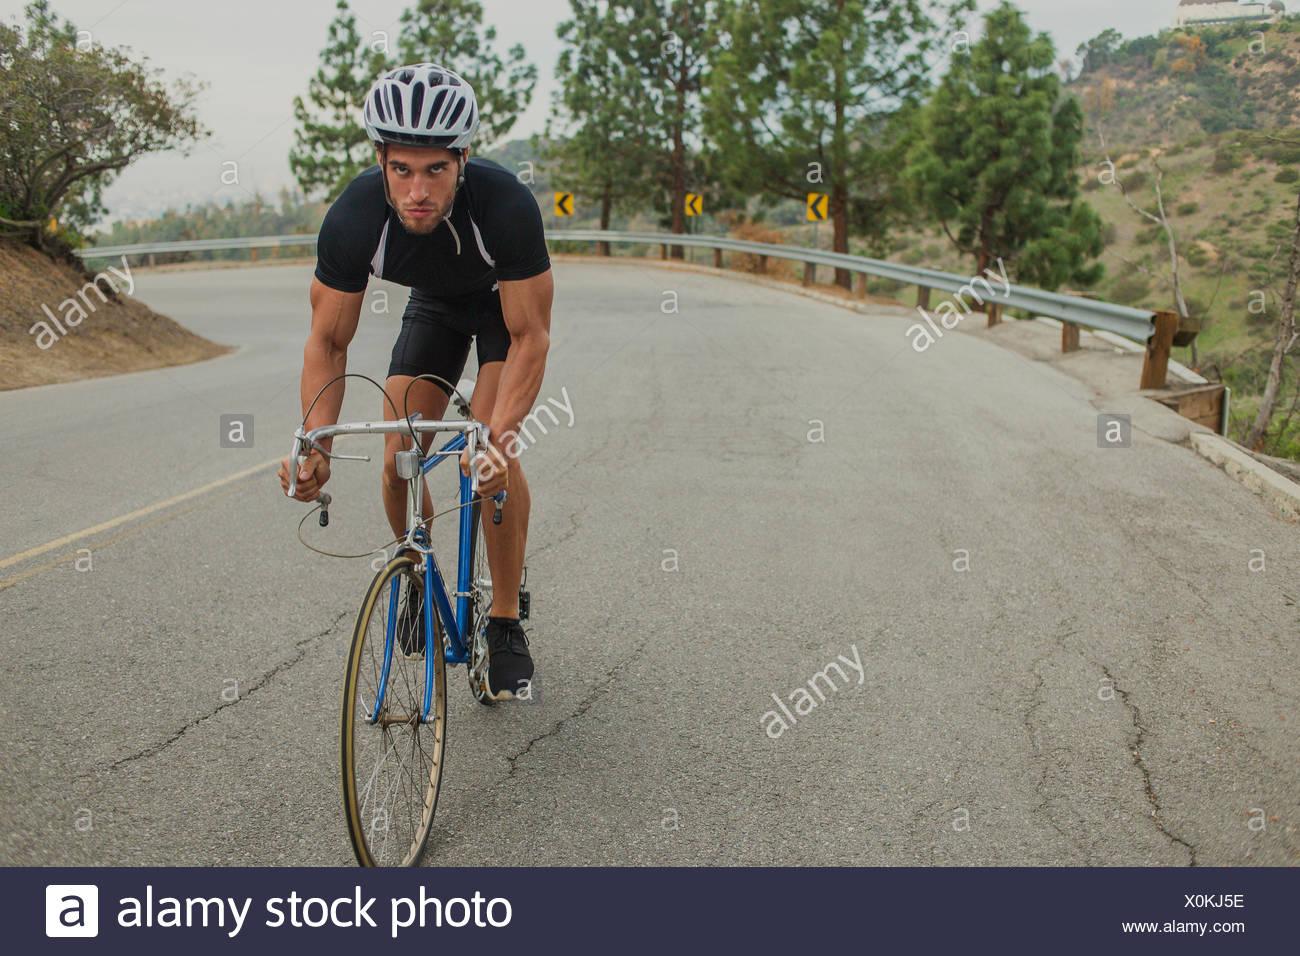 Ciclista en carretera ascendente Imagen De Stock